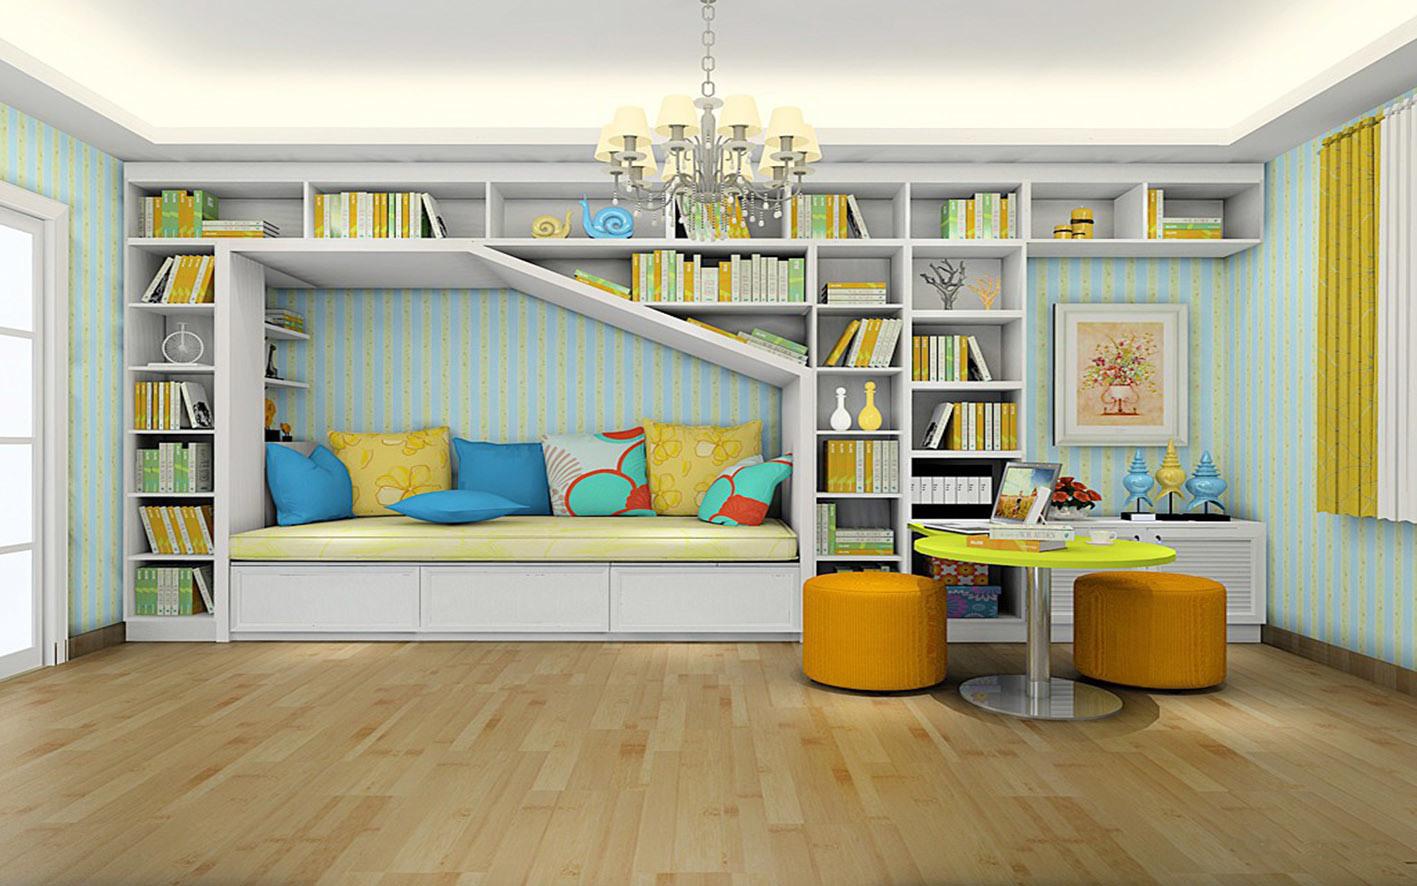 2017 New Modern Study Room Furniture (zj-001)